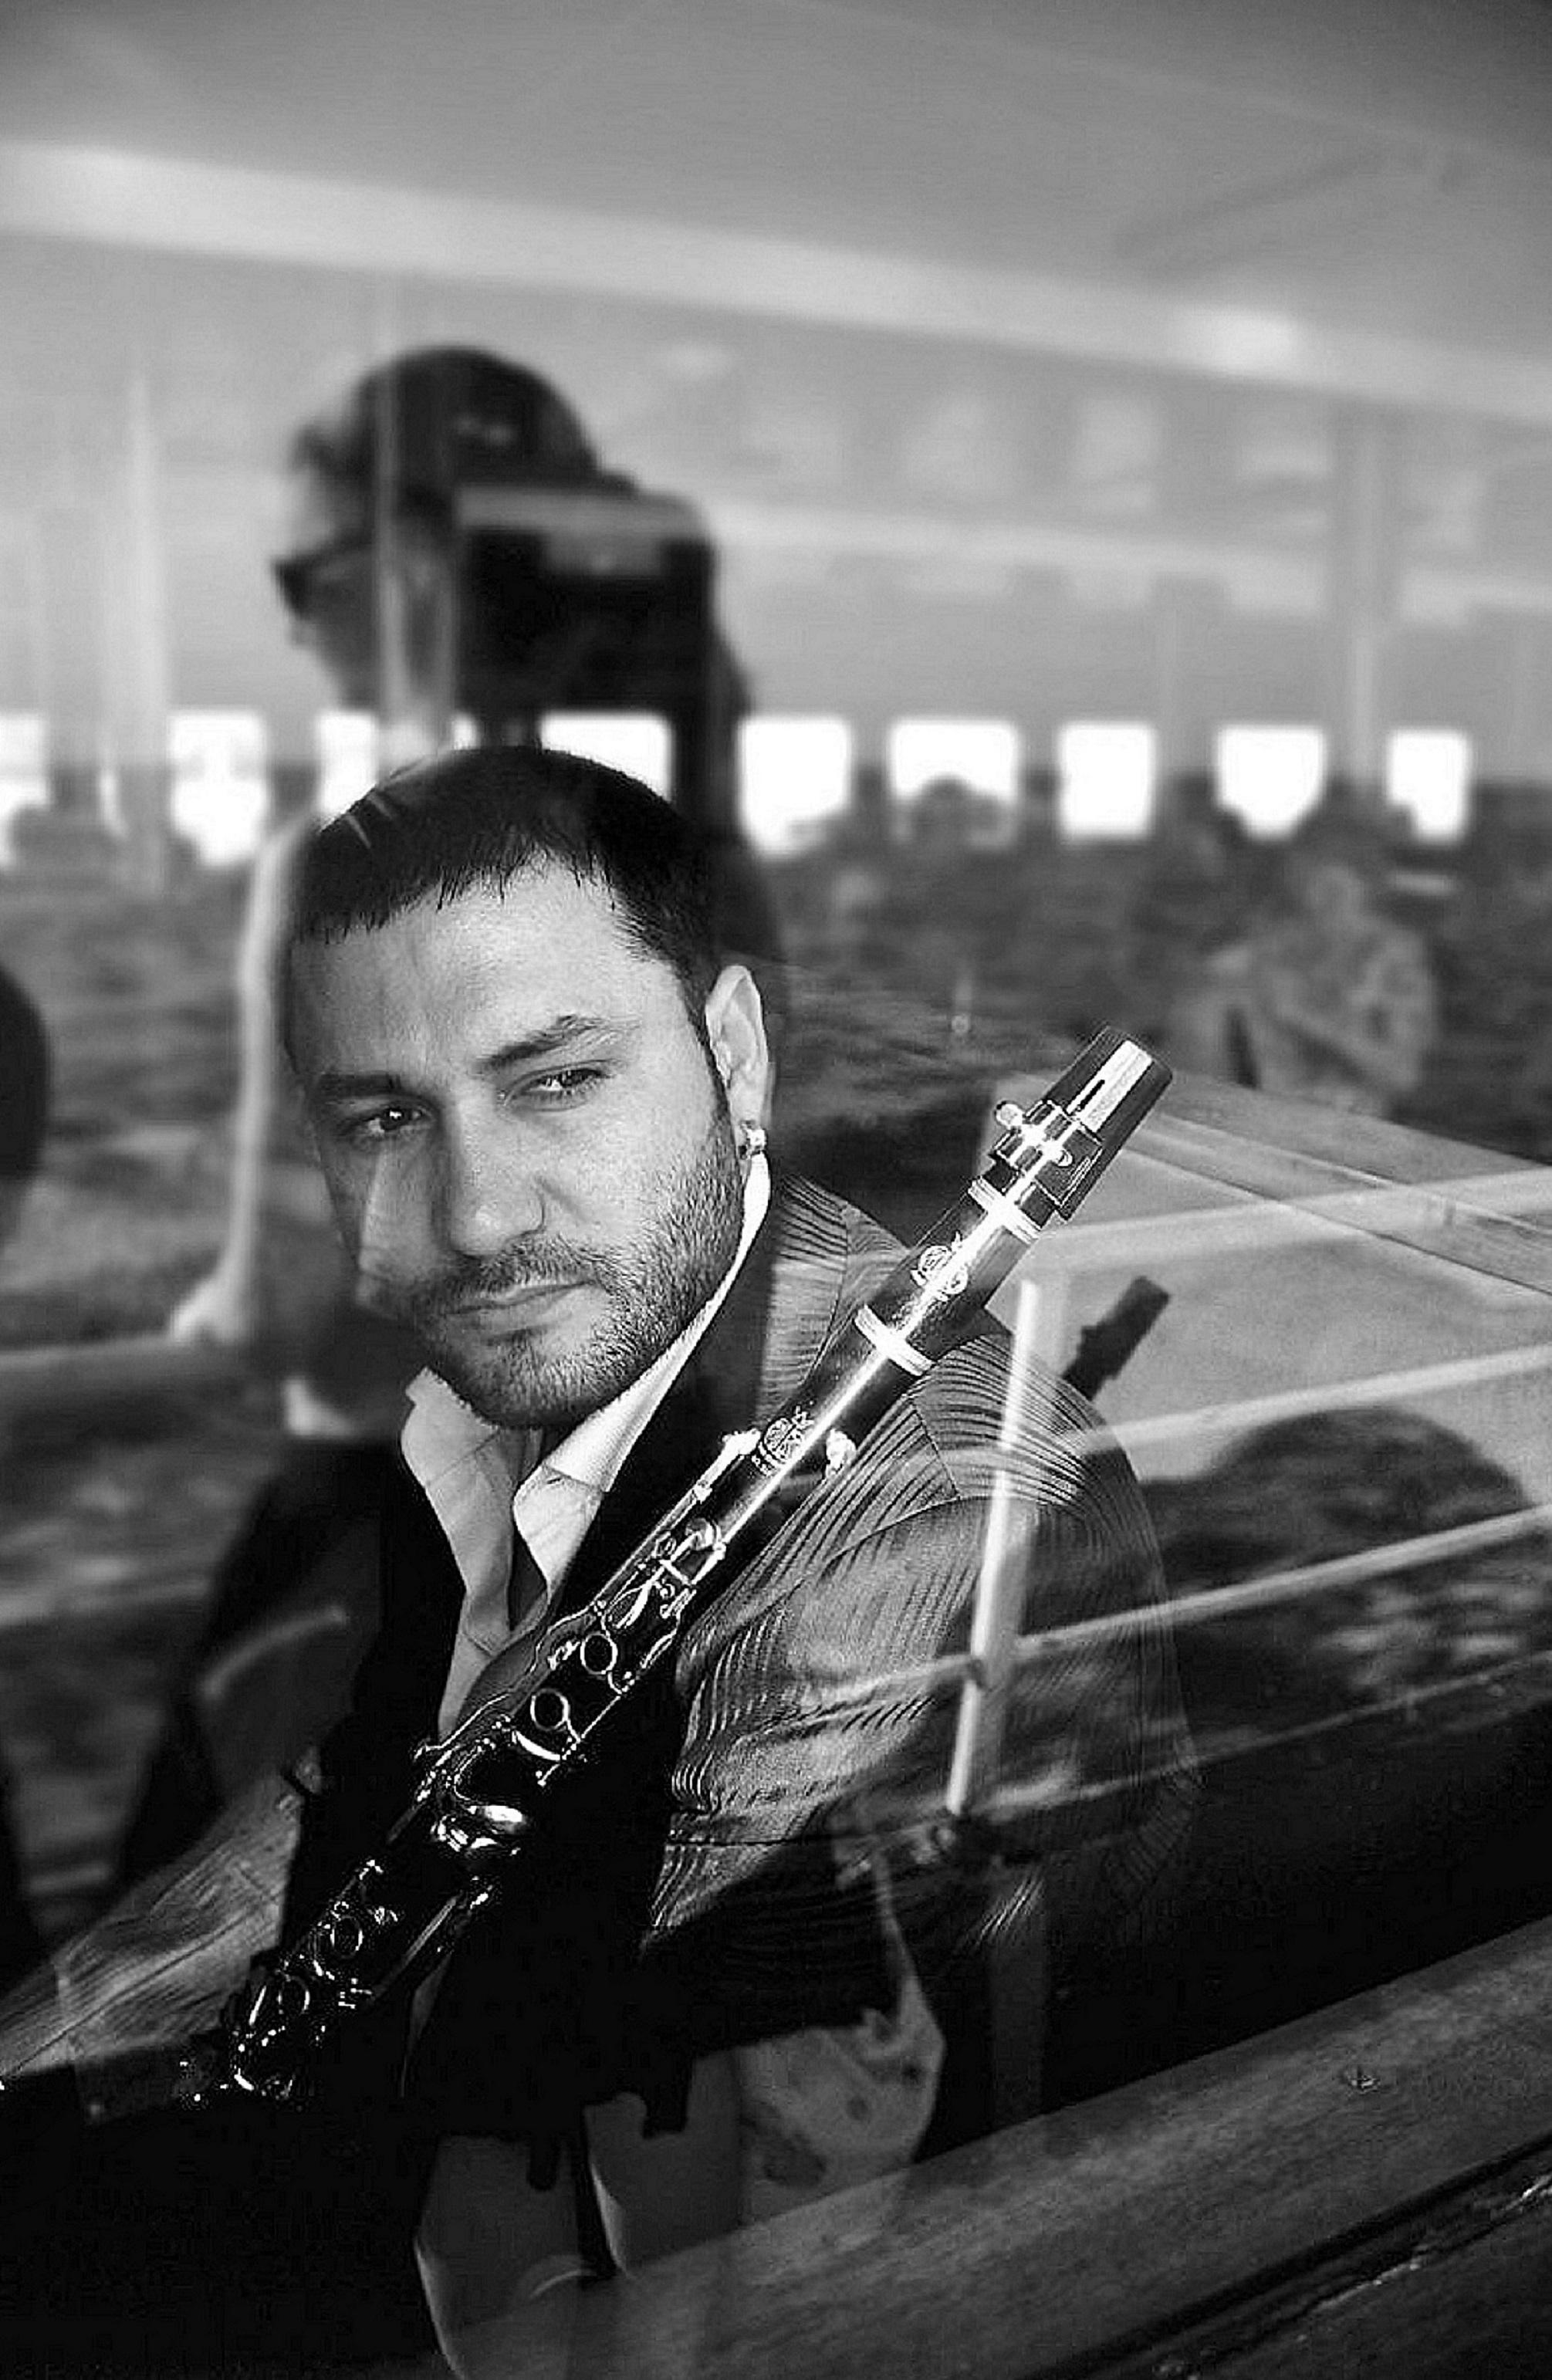 Hüsnü Şenlendirici, with Clarinet, on Istanbul Ferry